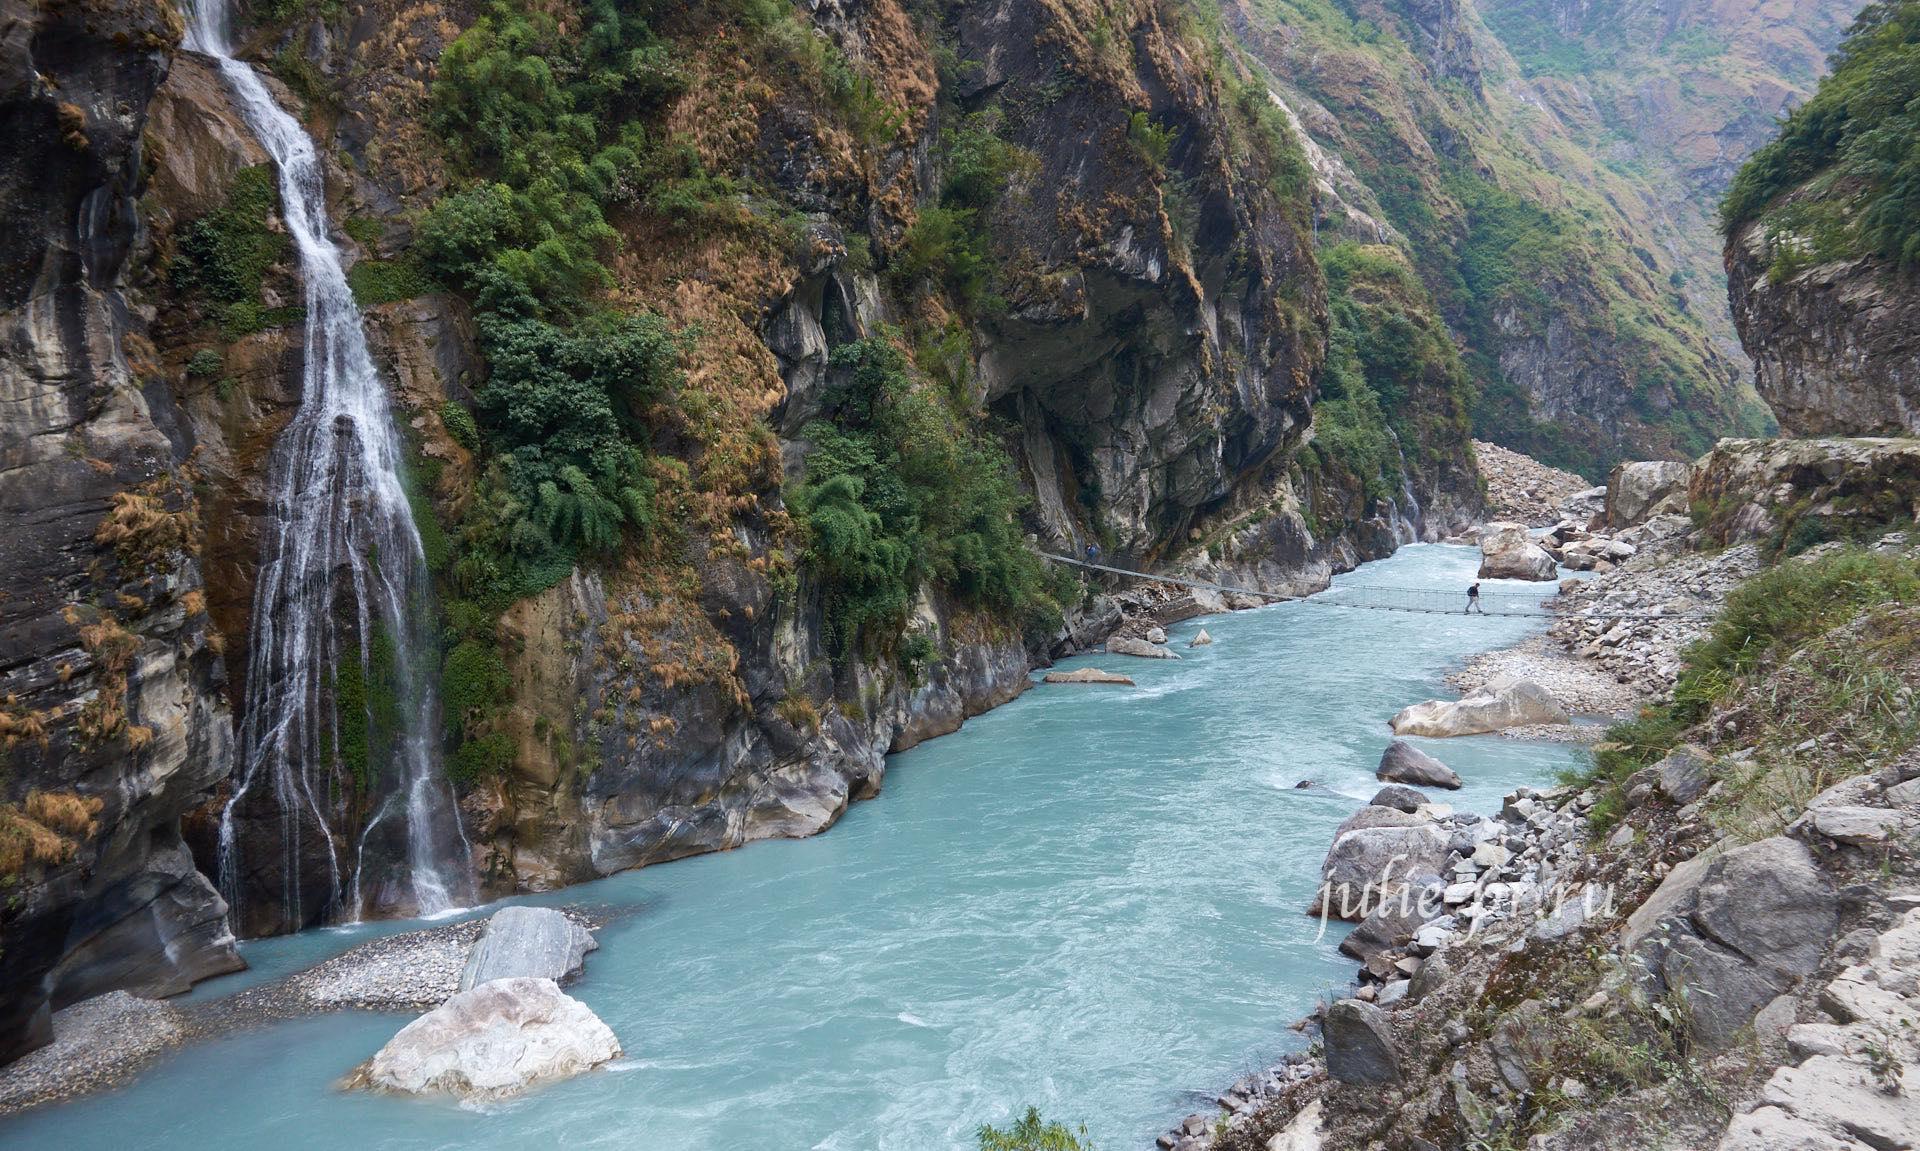 Непал, Трек вокруг Аннапурны, водопад на реке Марсъянди